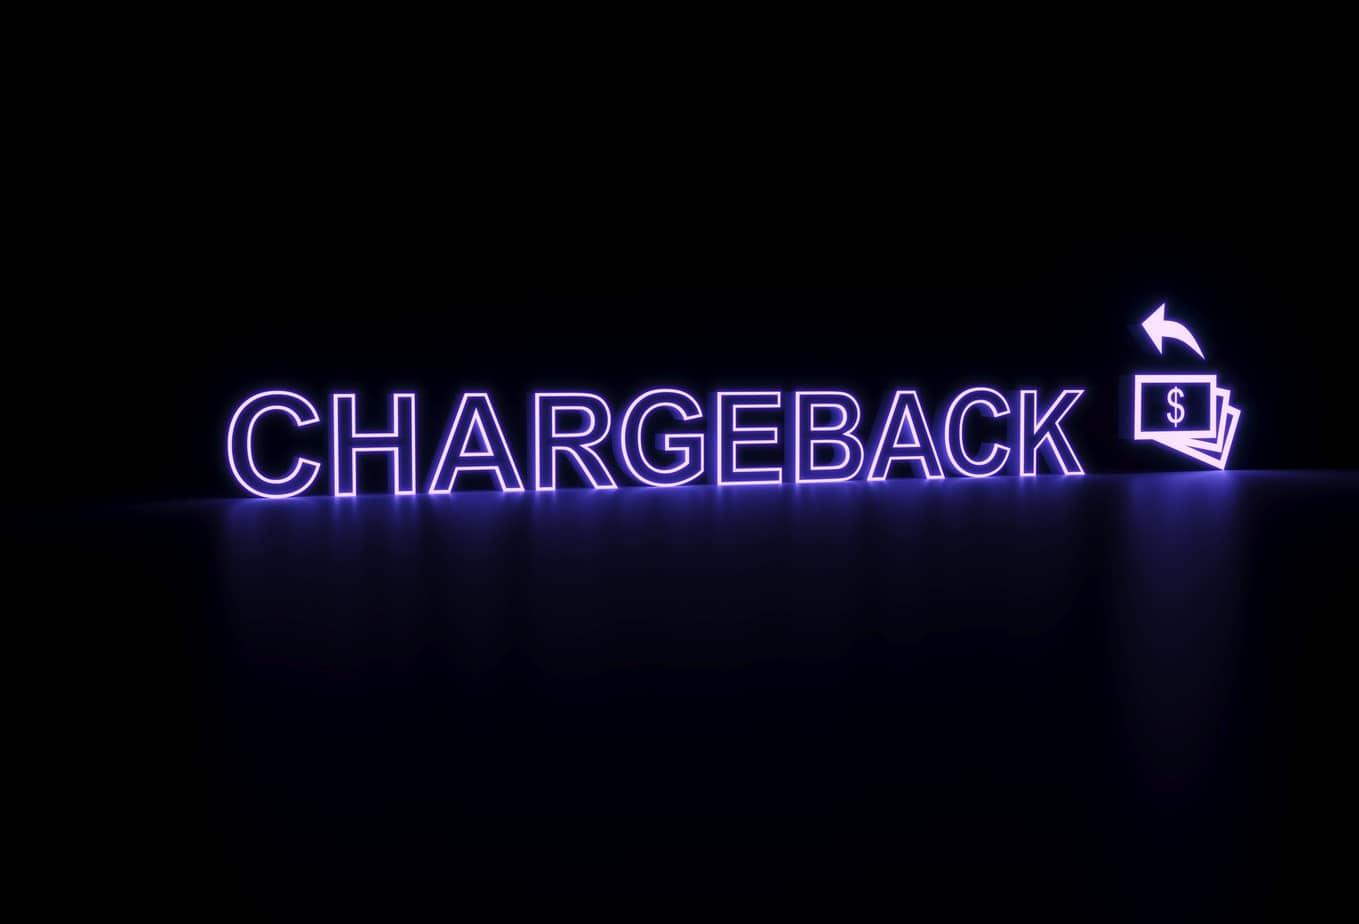 chargeback neon concept self illumination background 178854354